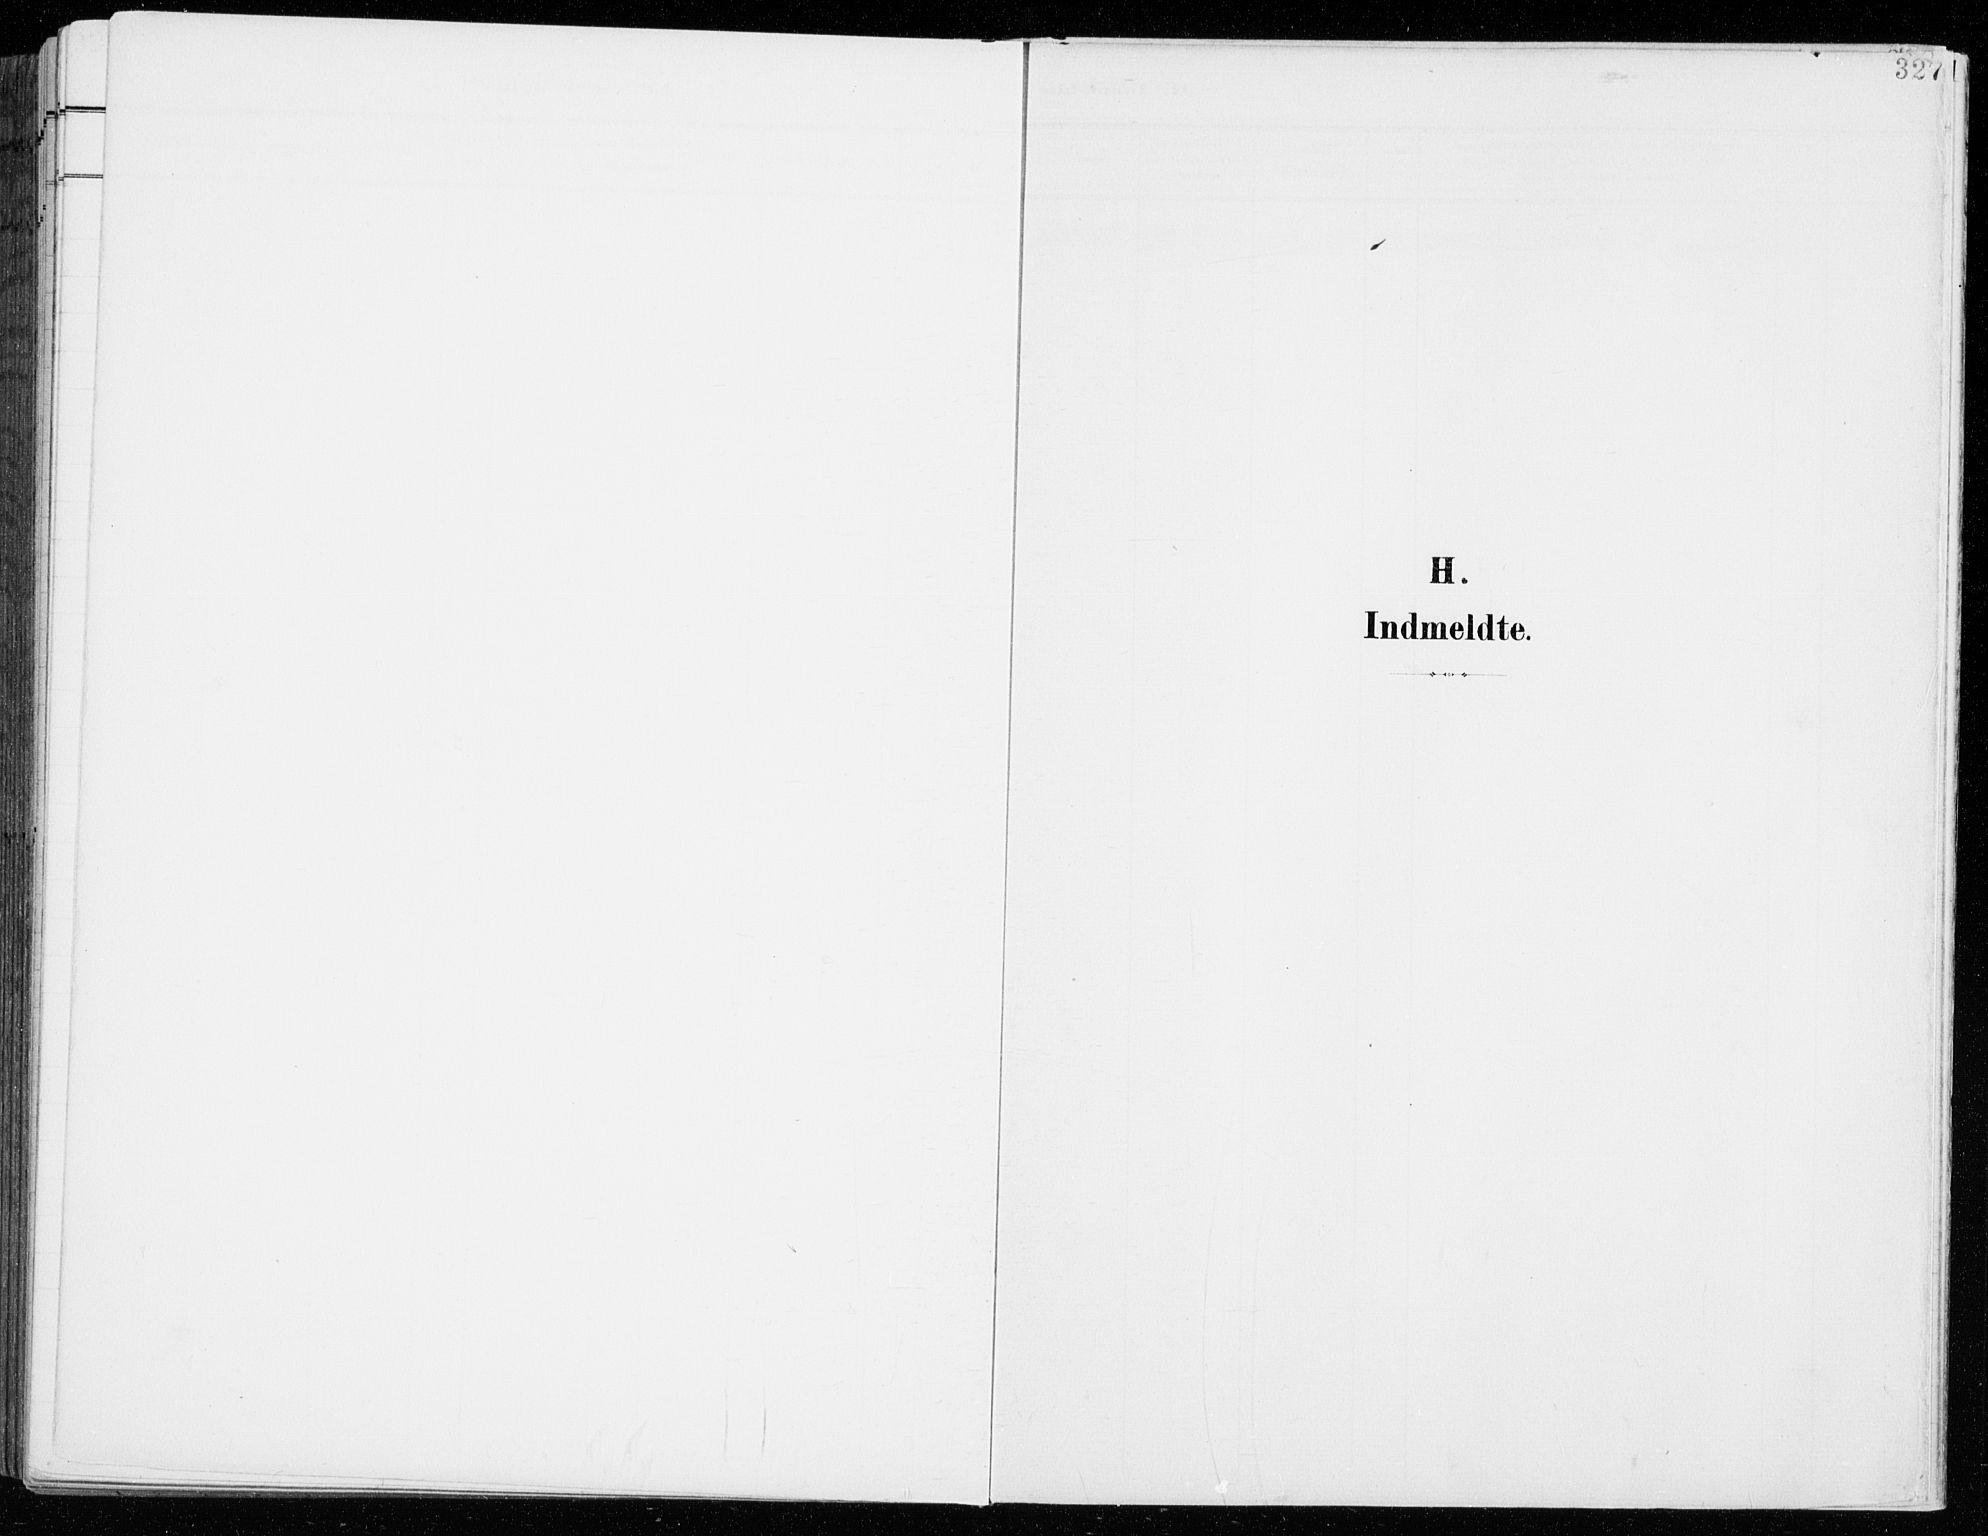 SAH, Fåberg prestekontor, H/Ha/Haa/L0011: Parish register (official) no. 11, 1899-1913, p. 327